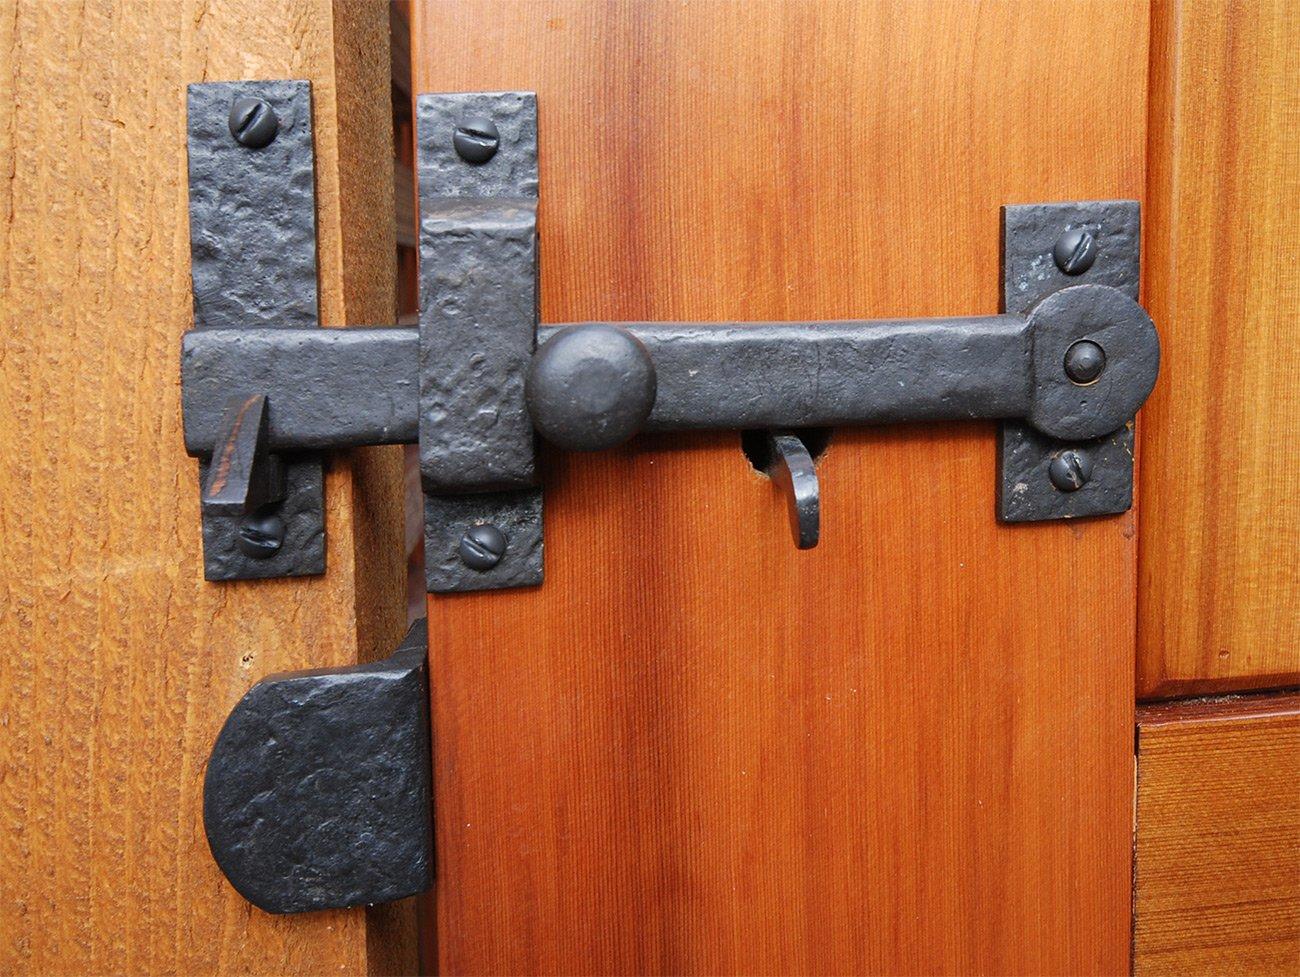 Coastal Bronze - Complete Gate Kit - Hinges / Thumb Latch / Drop Bar Set by Coastal Bronze (Image #2)